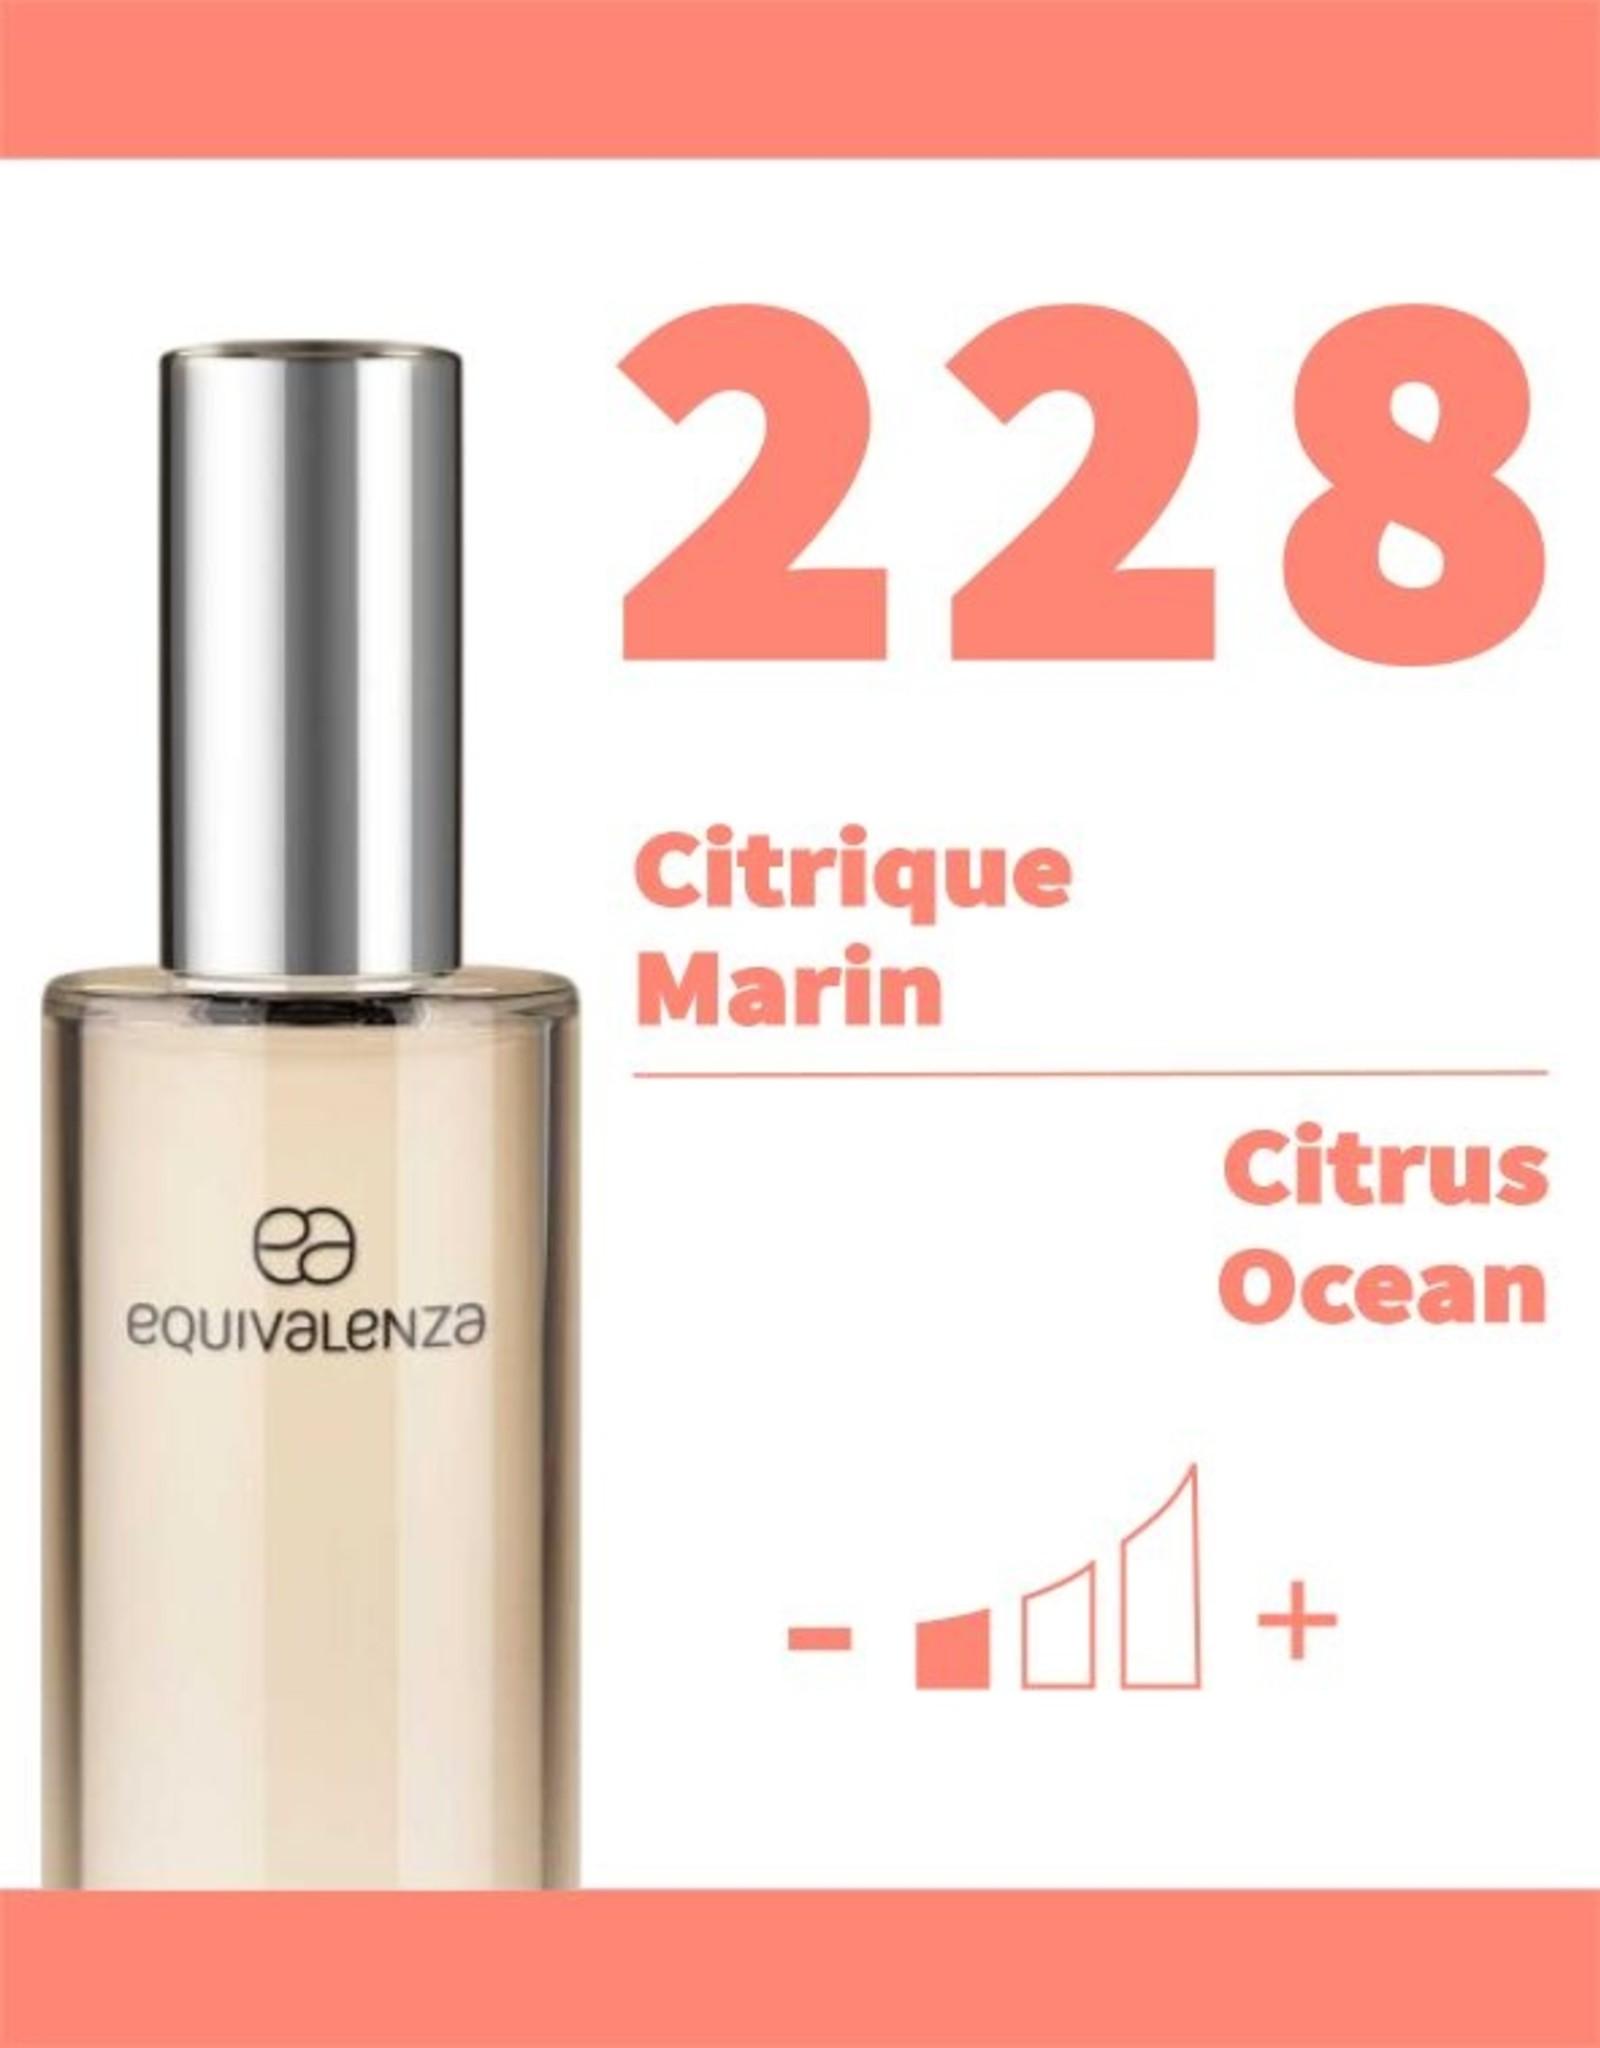 Equivalenza Citrus Ocean 228